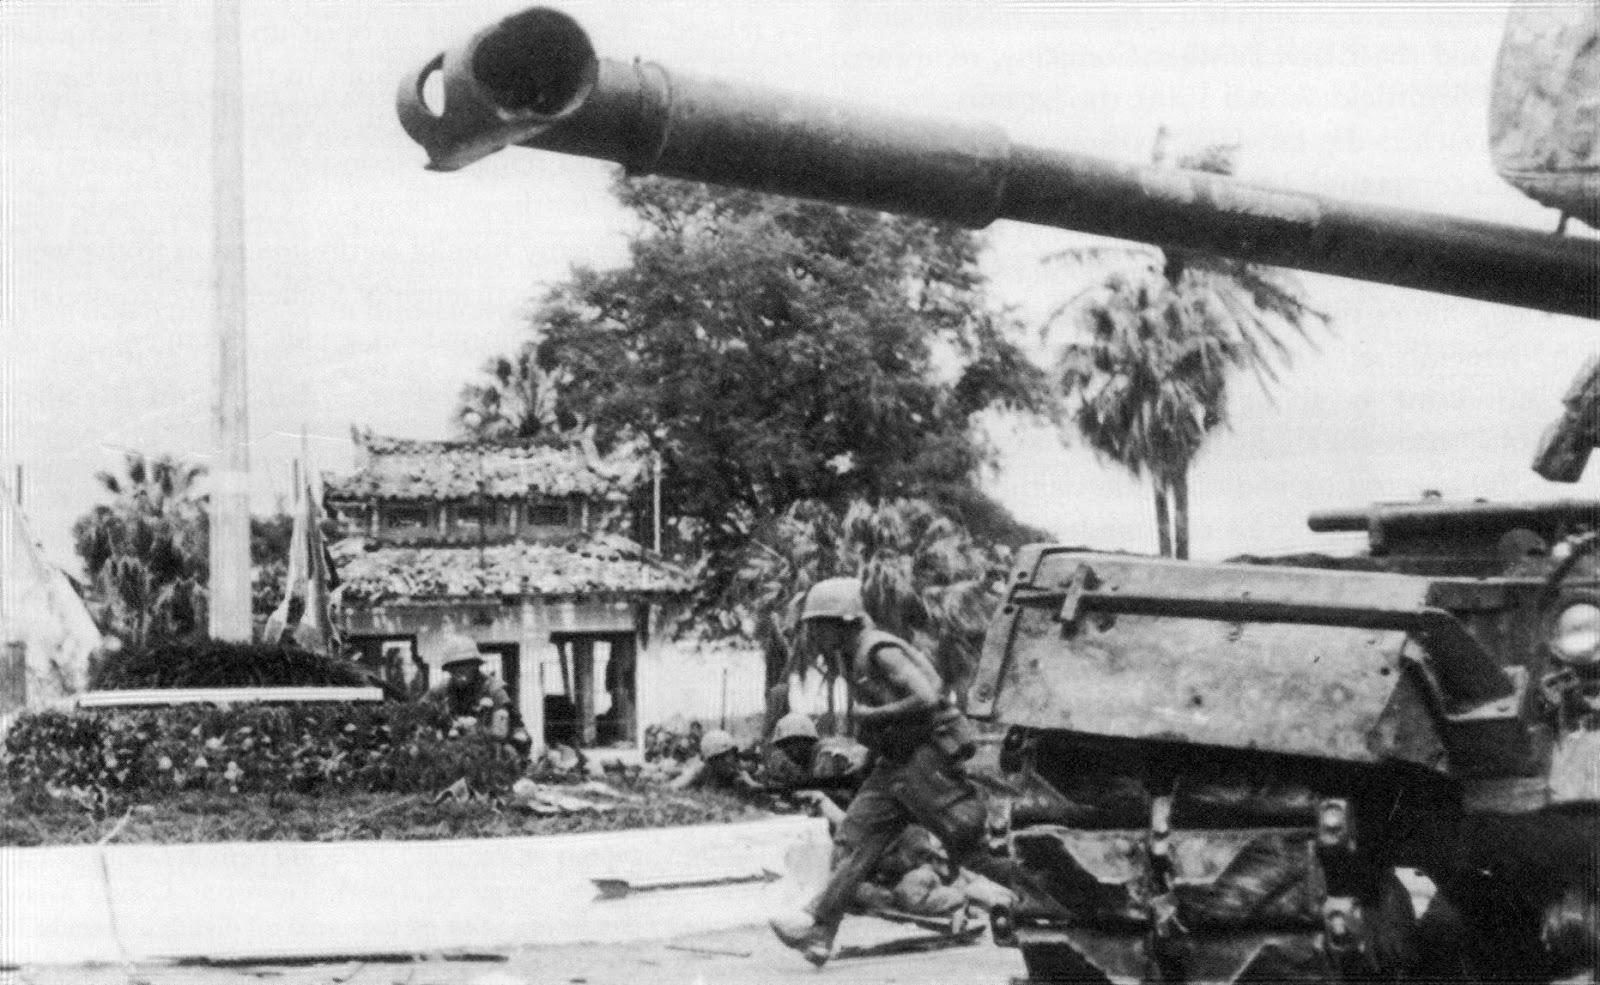 1968 The Tet Offensive Breaks Morale